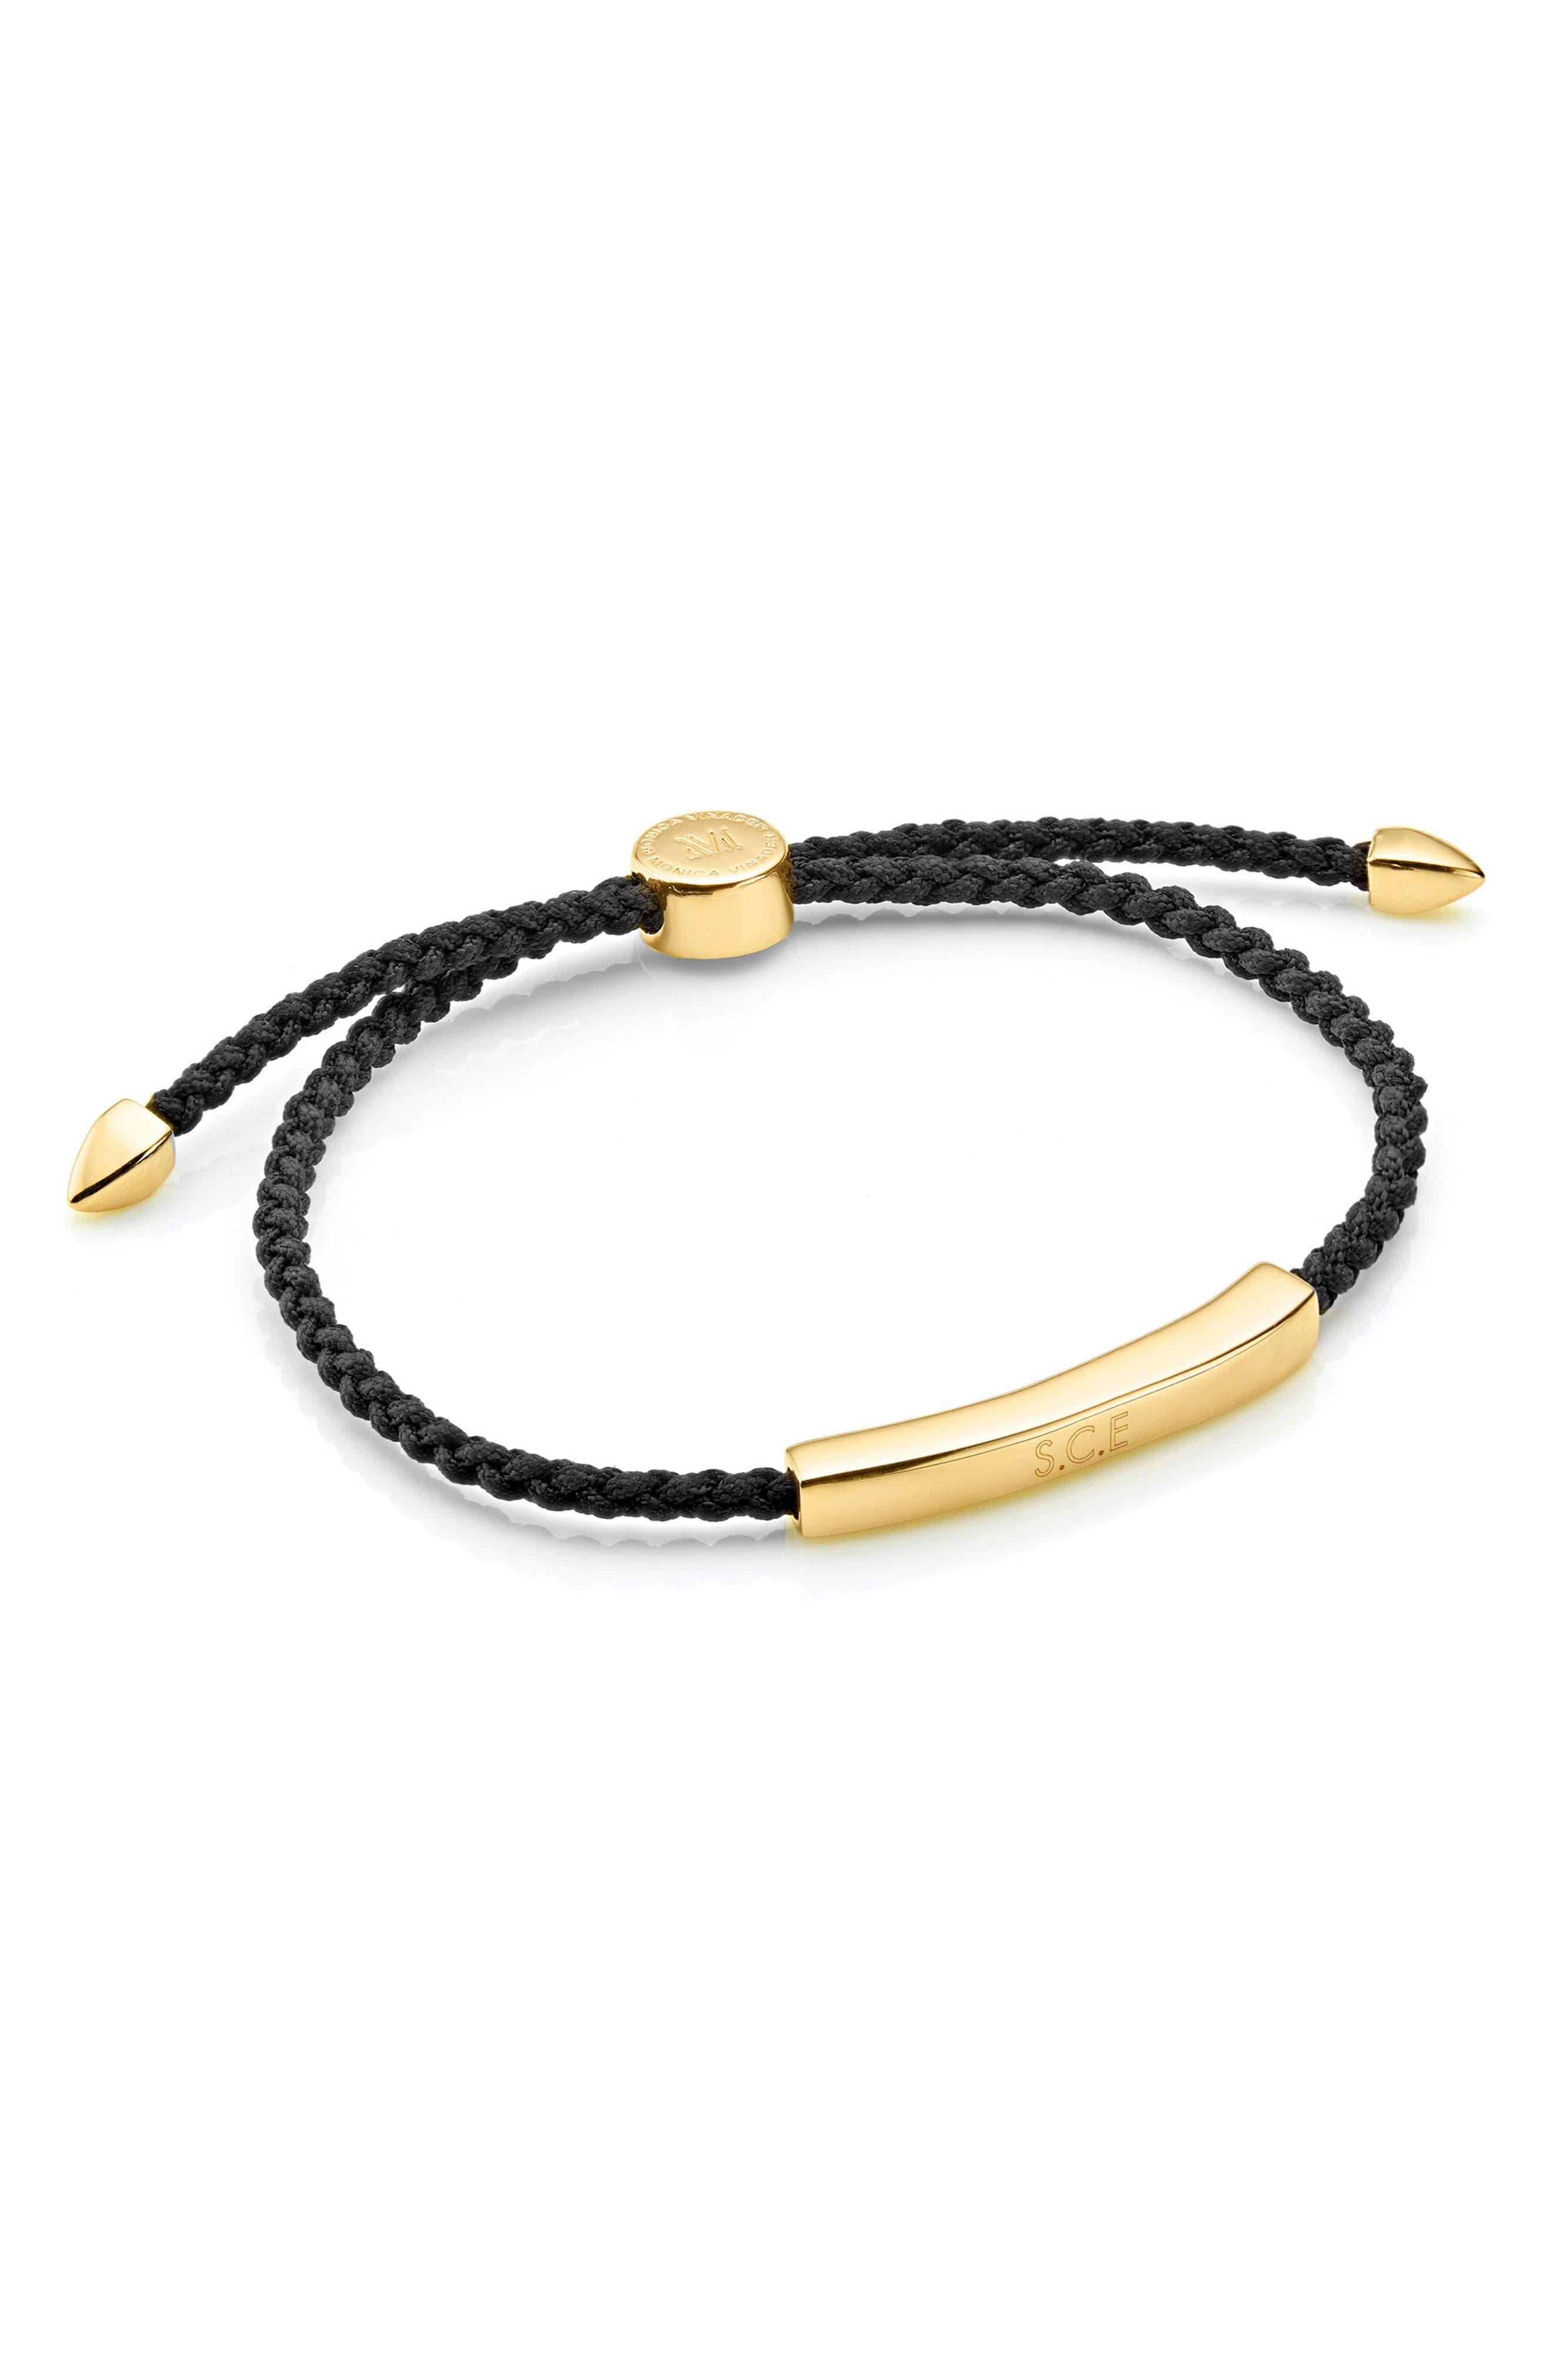 Engravable Men's Linear Friendship Bracelet,                             Alternate thumbnail 2, color,                             BLACK/ YELLOW GOLD